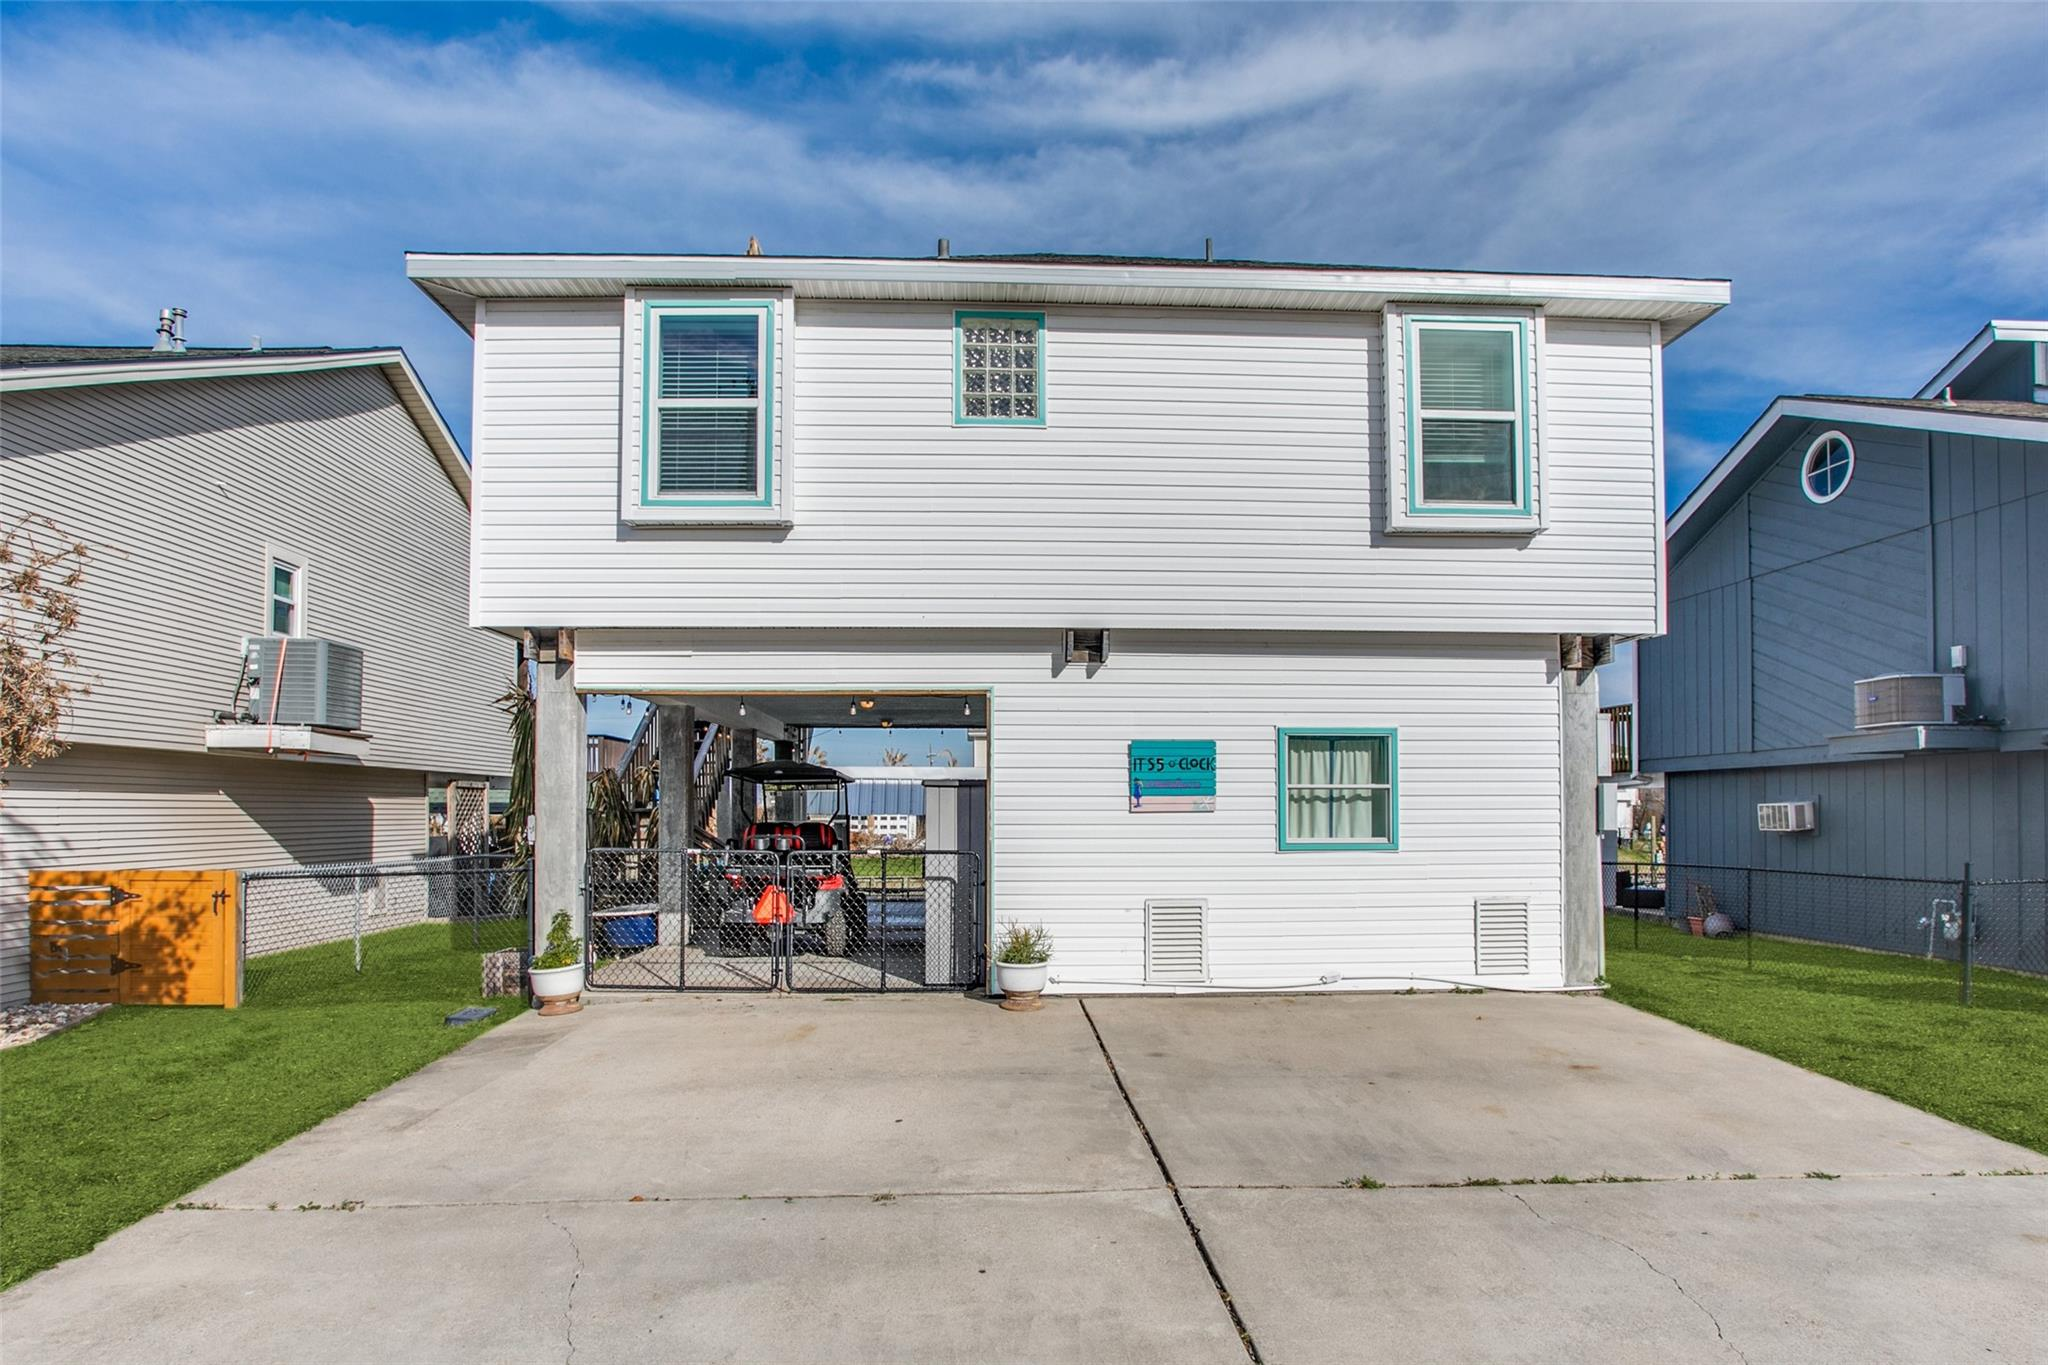 20 N Sandpiper Street Property Photo - La Marque, TX real estate listing